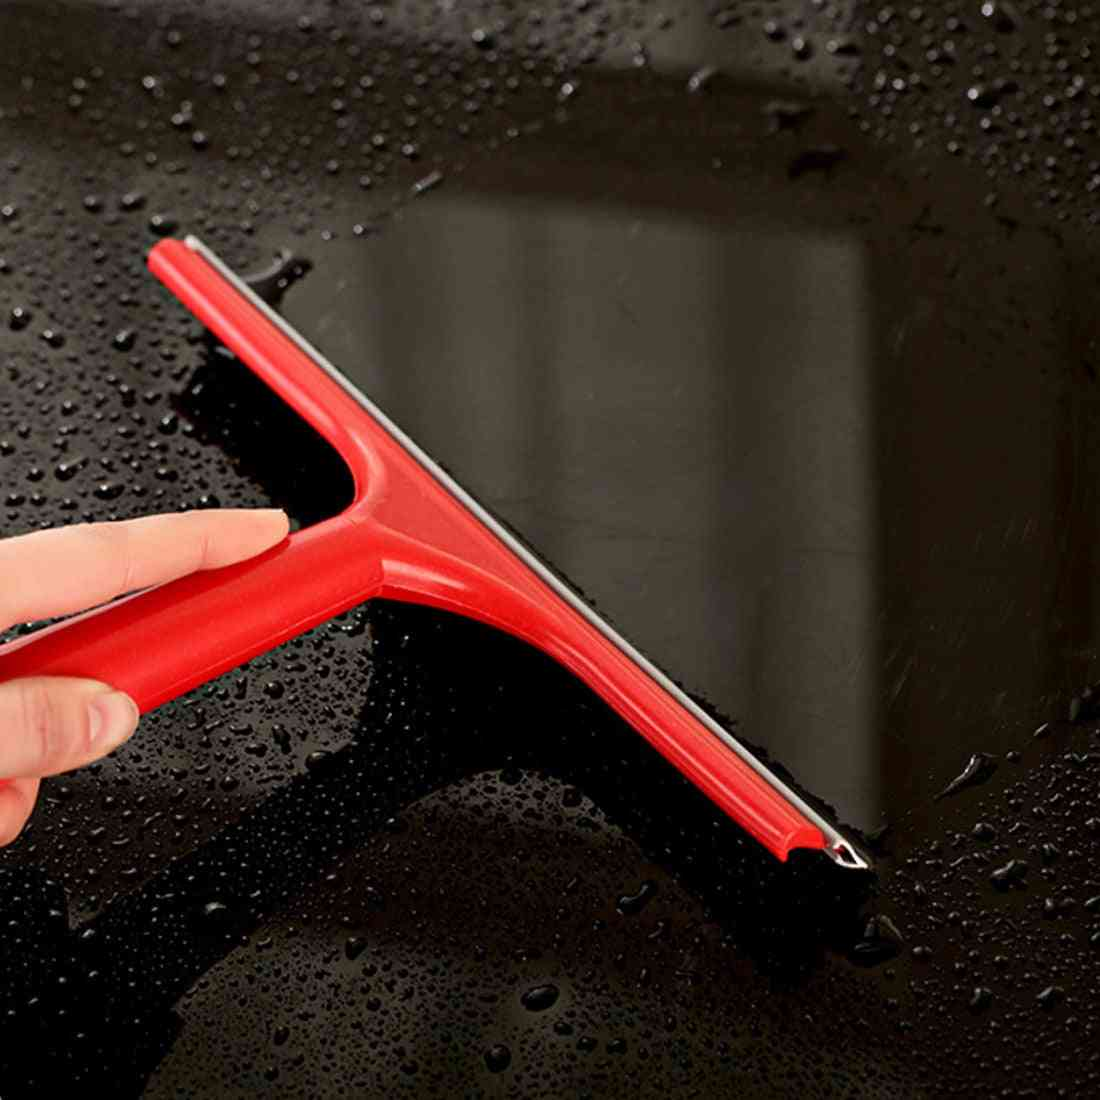 Car Water Wiper Soap Cleaner, Scraper, Windshield Window Cleaning Tool